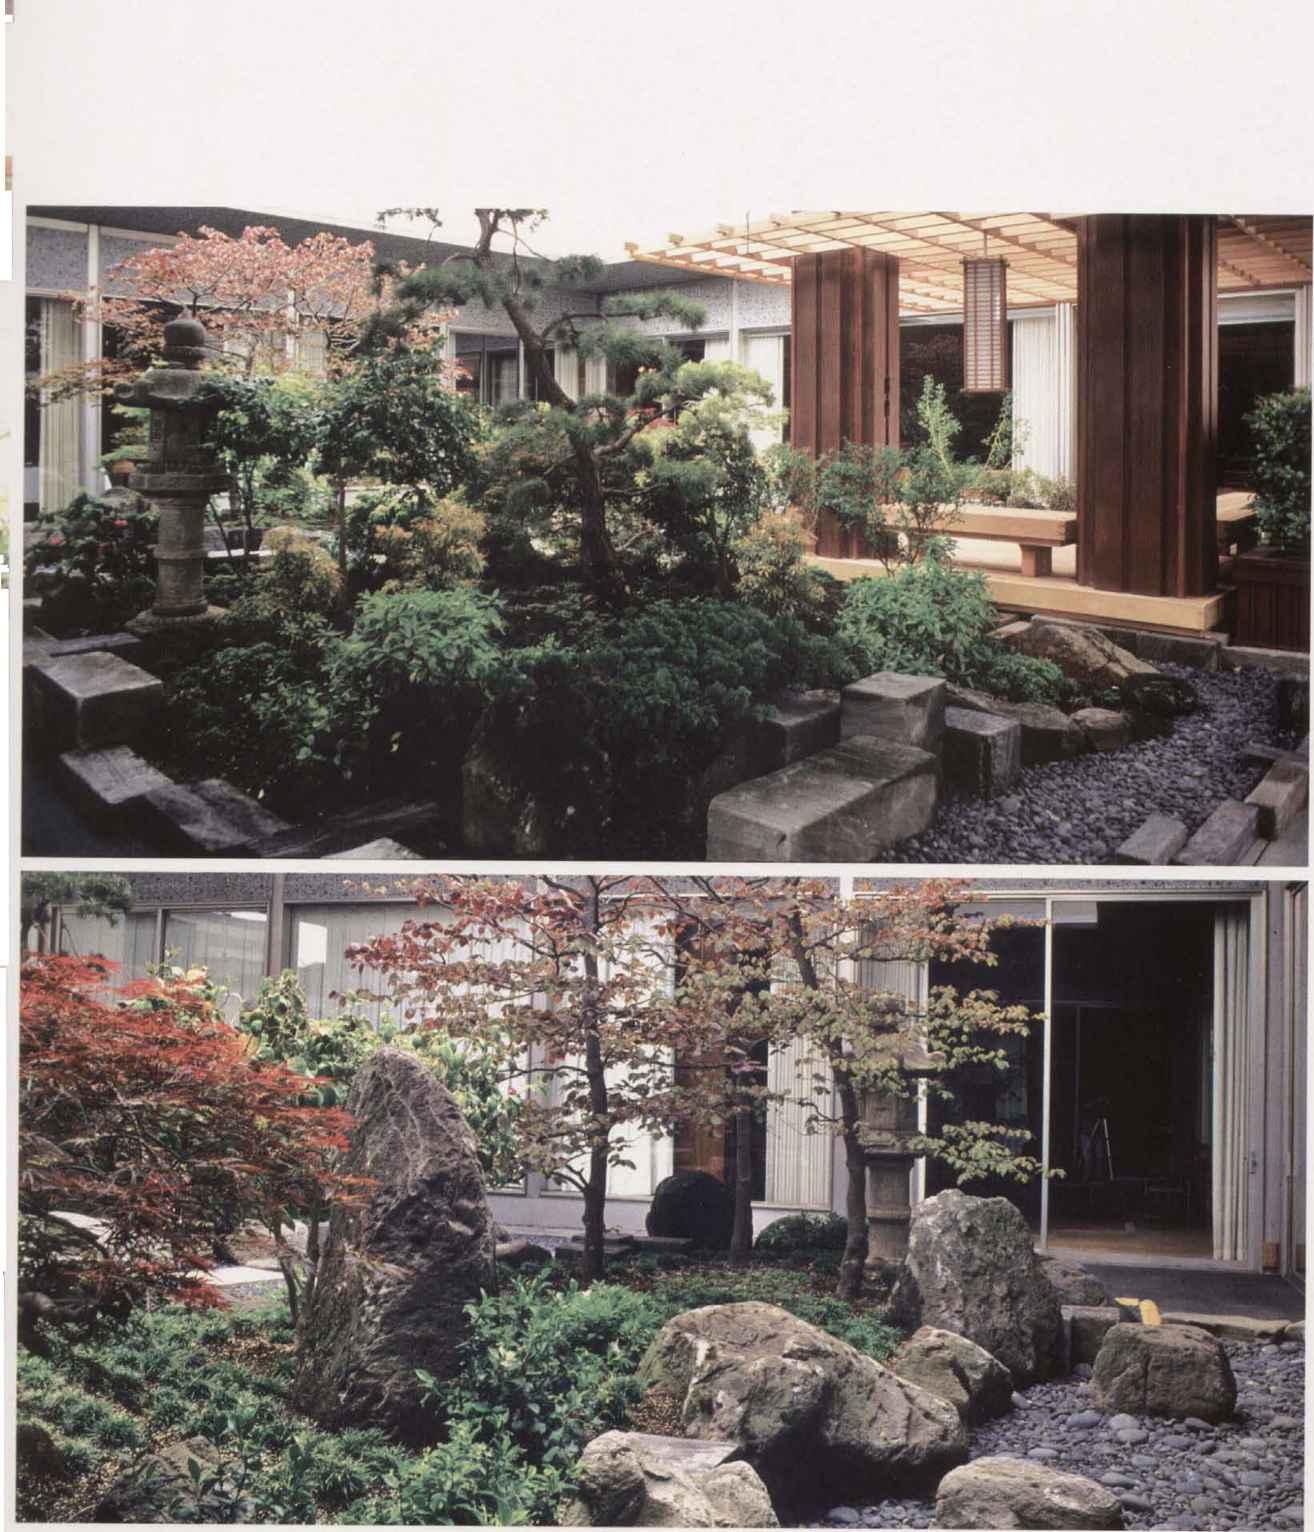 Suzman cole design associates landscape design for Landscape design associates